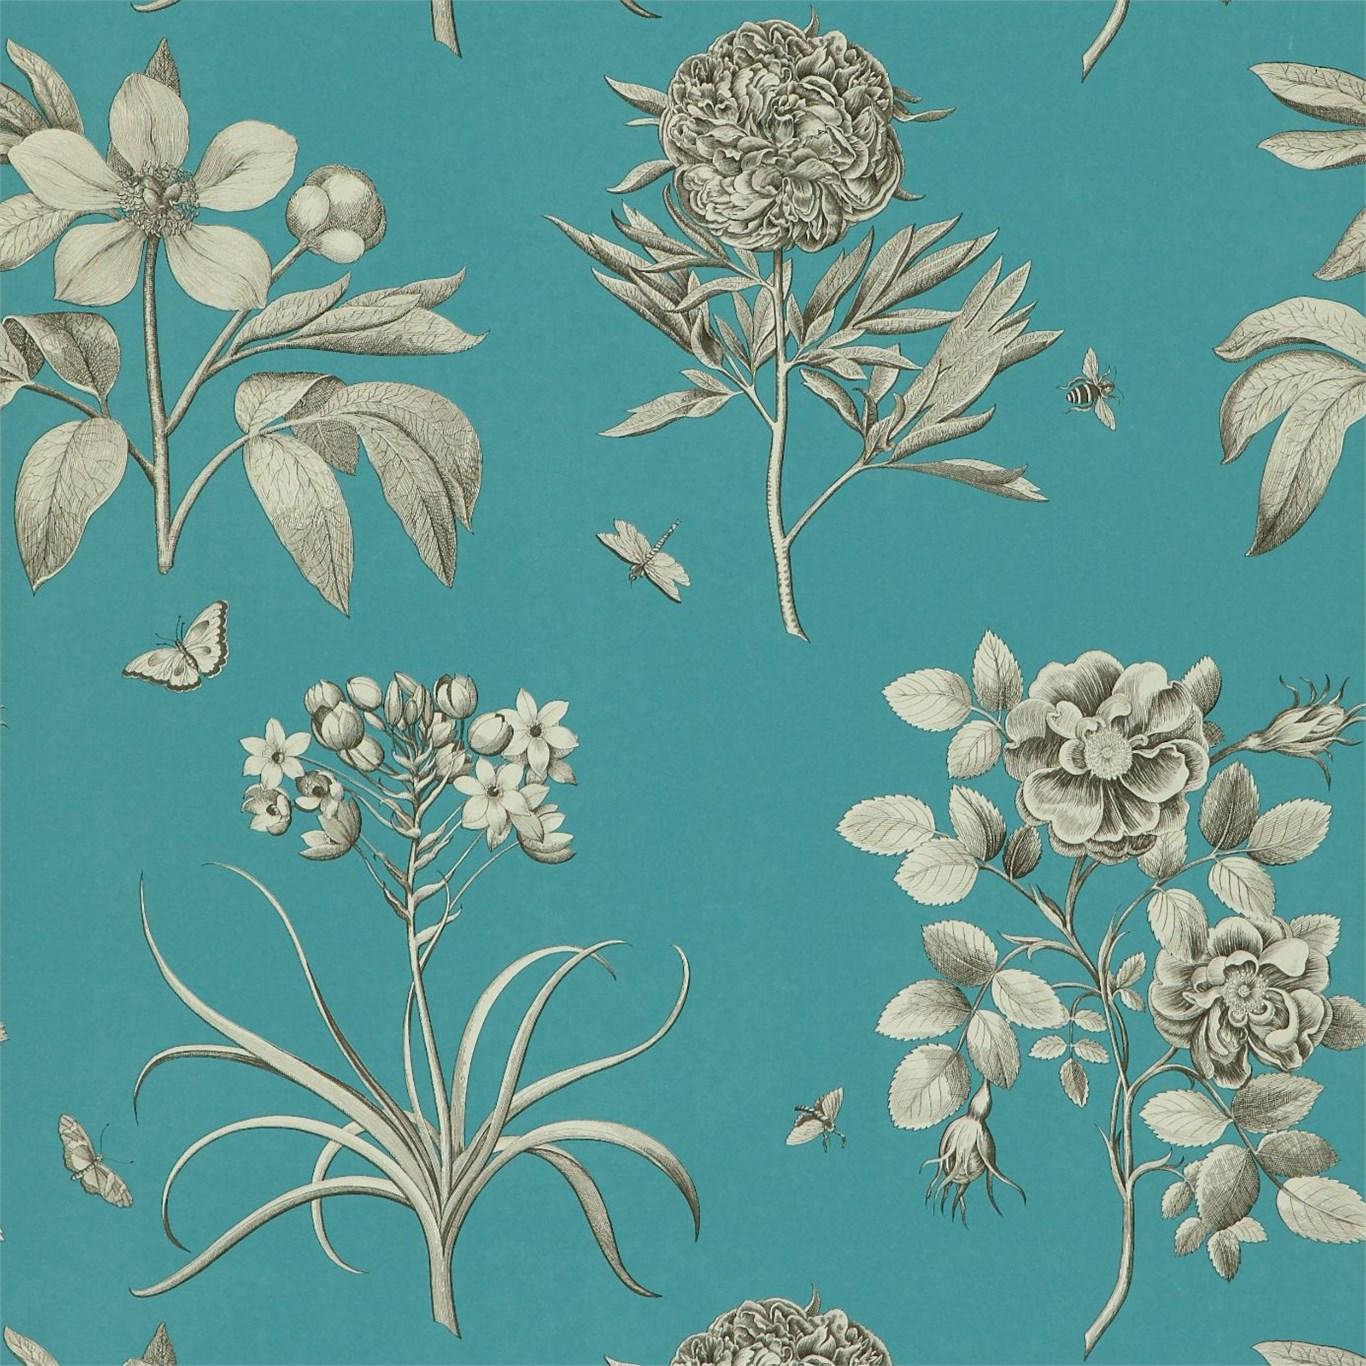 Обои Sanderson Parchment Flowers DPFWER103, интернет магазин Волео